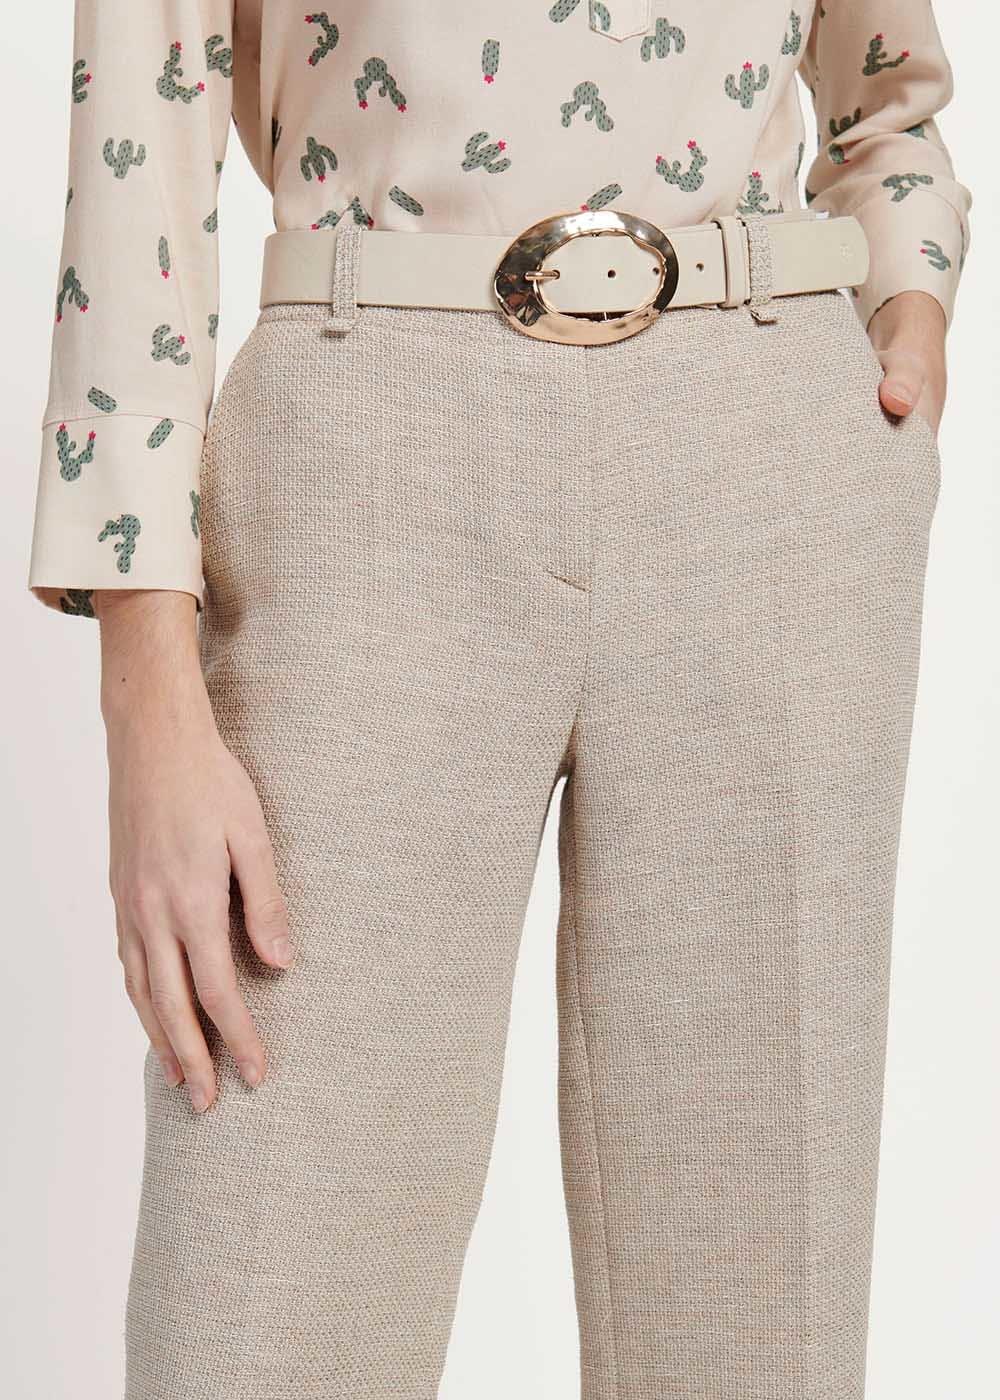 Clop belt with hammered buckle - Light Beige - Woman